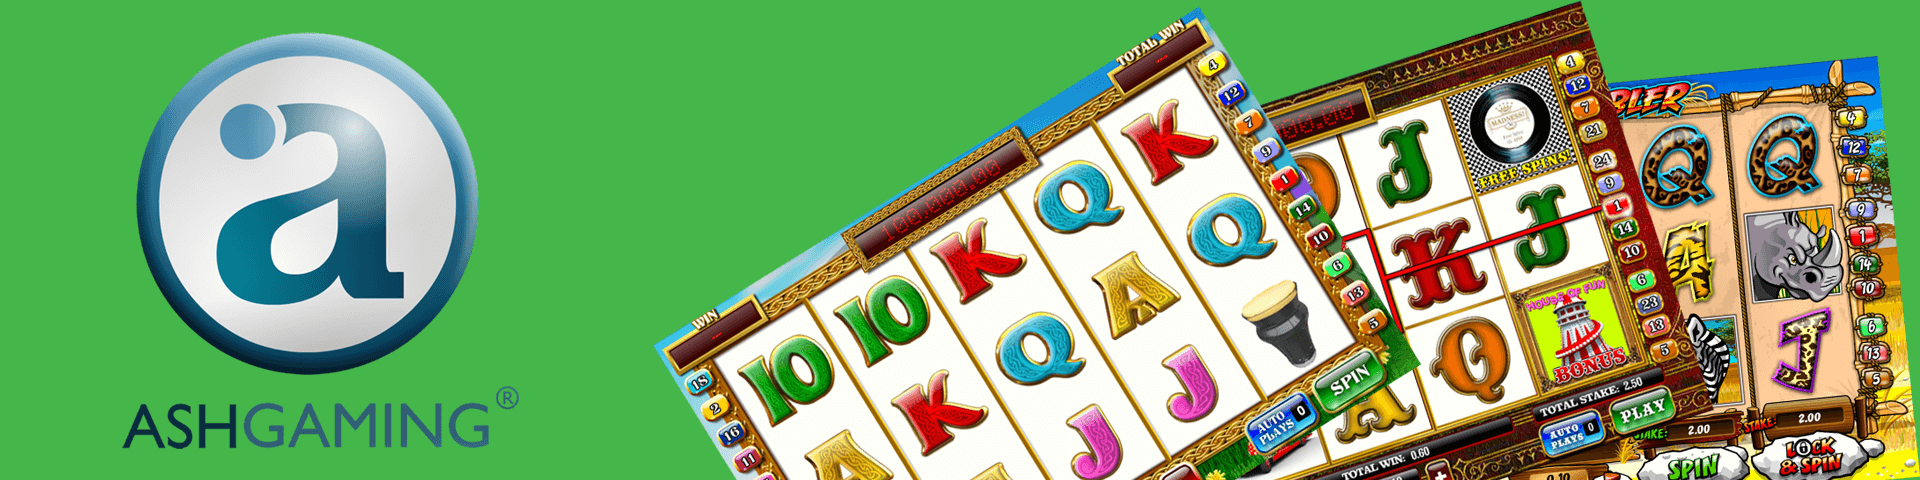 jocuri-casino-Ash Gaming-multabafta-slider